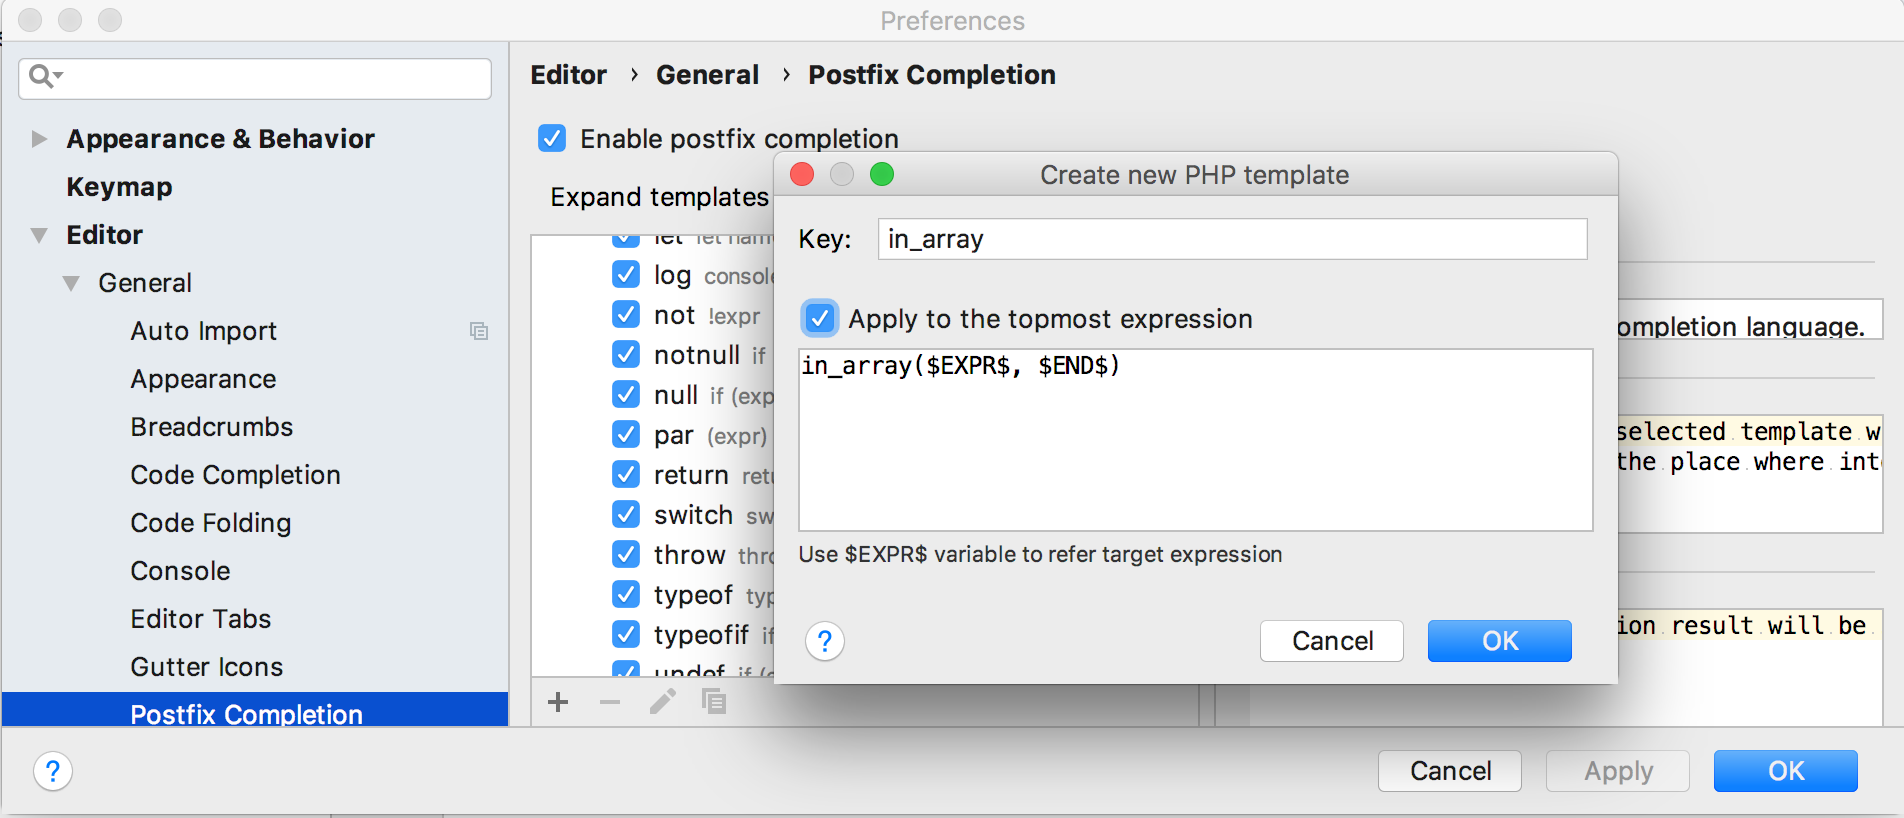 Custom postfix completion templates PhpStorm 2018.2